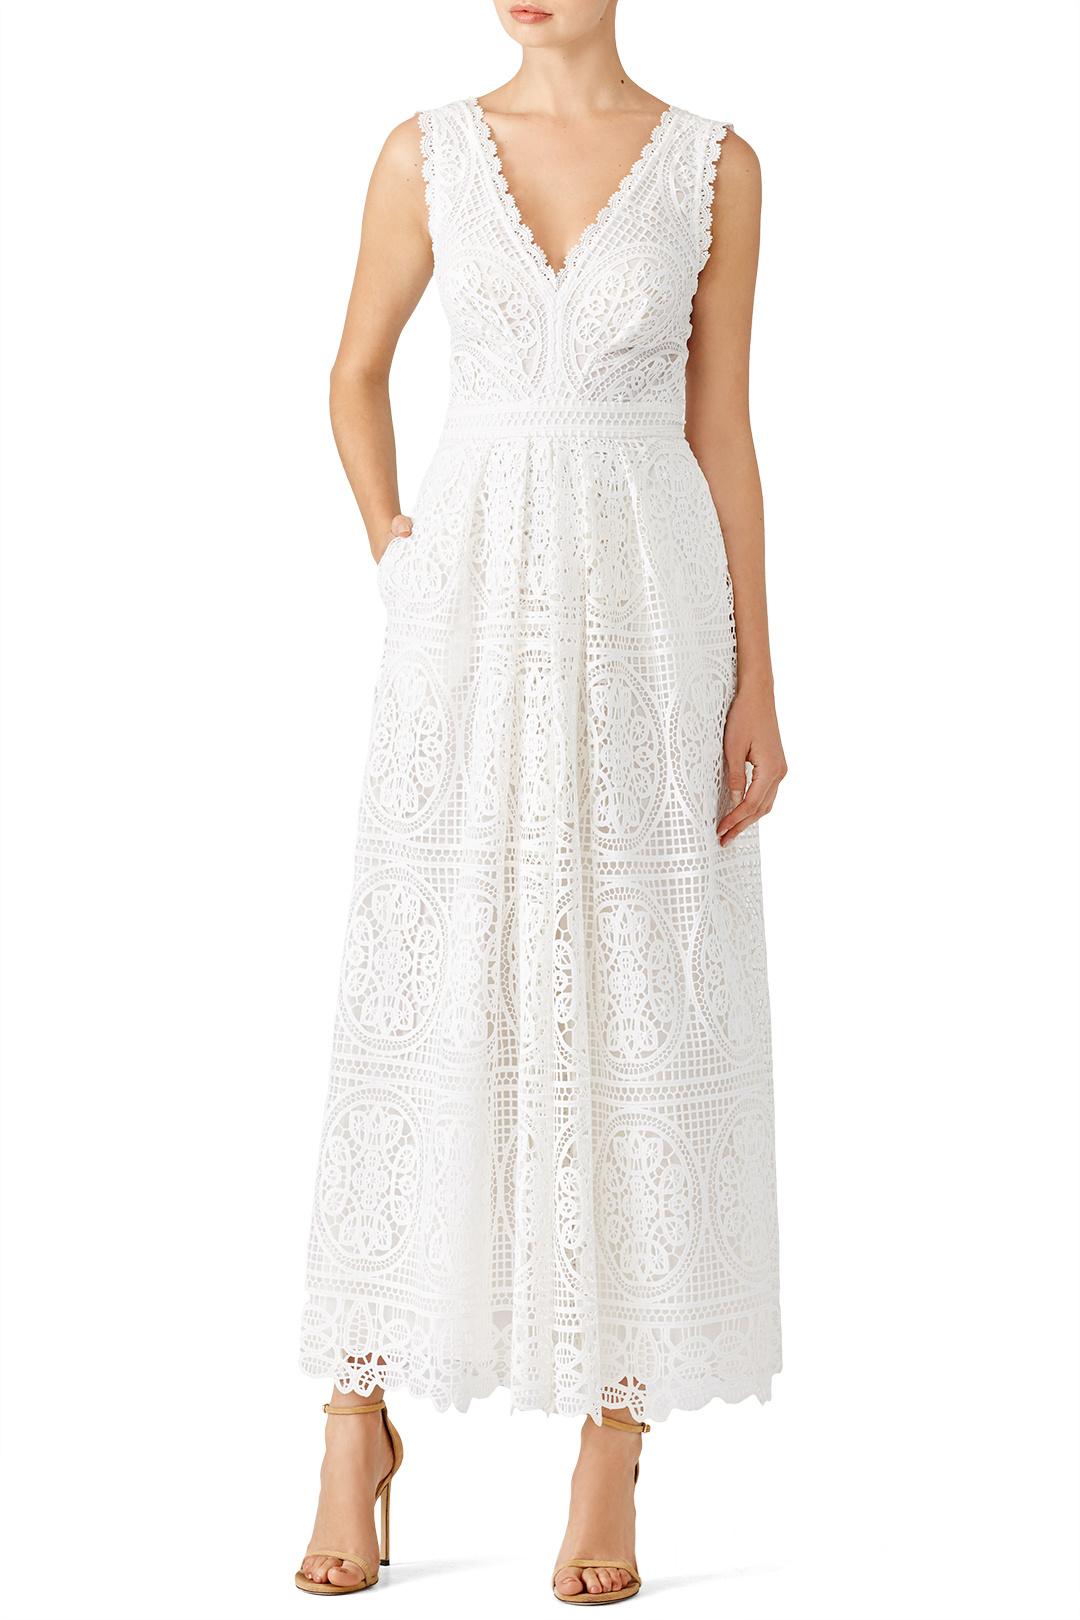 Temperley London White Lace Jumpsuit